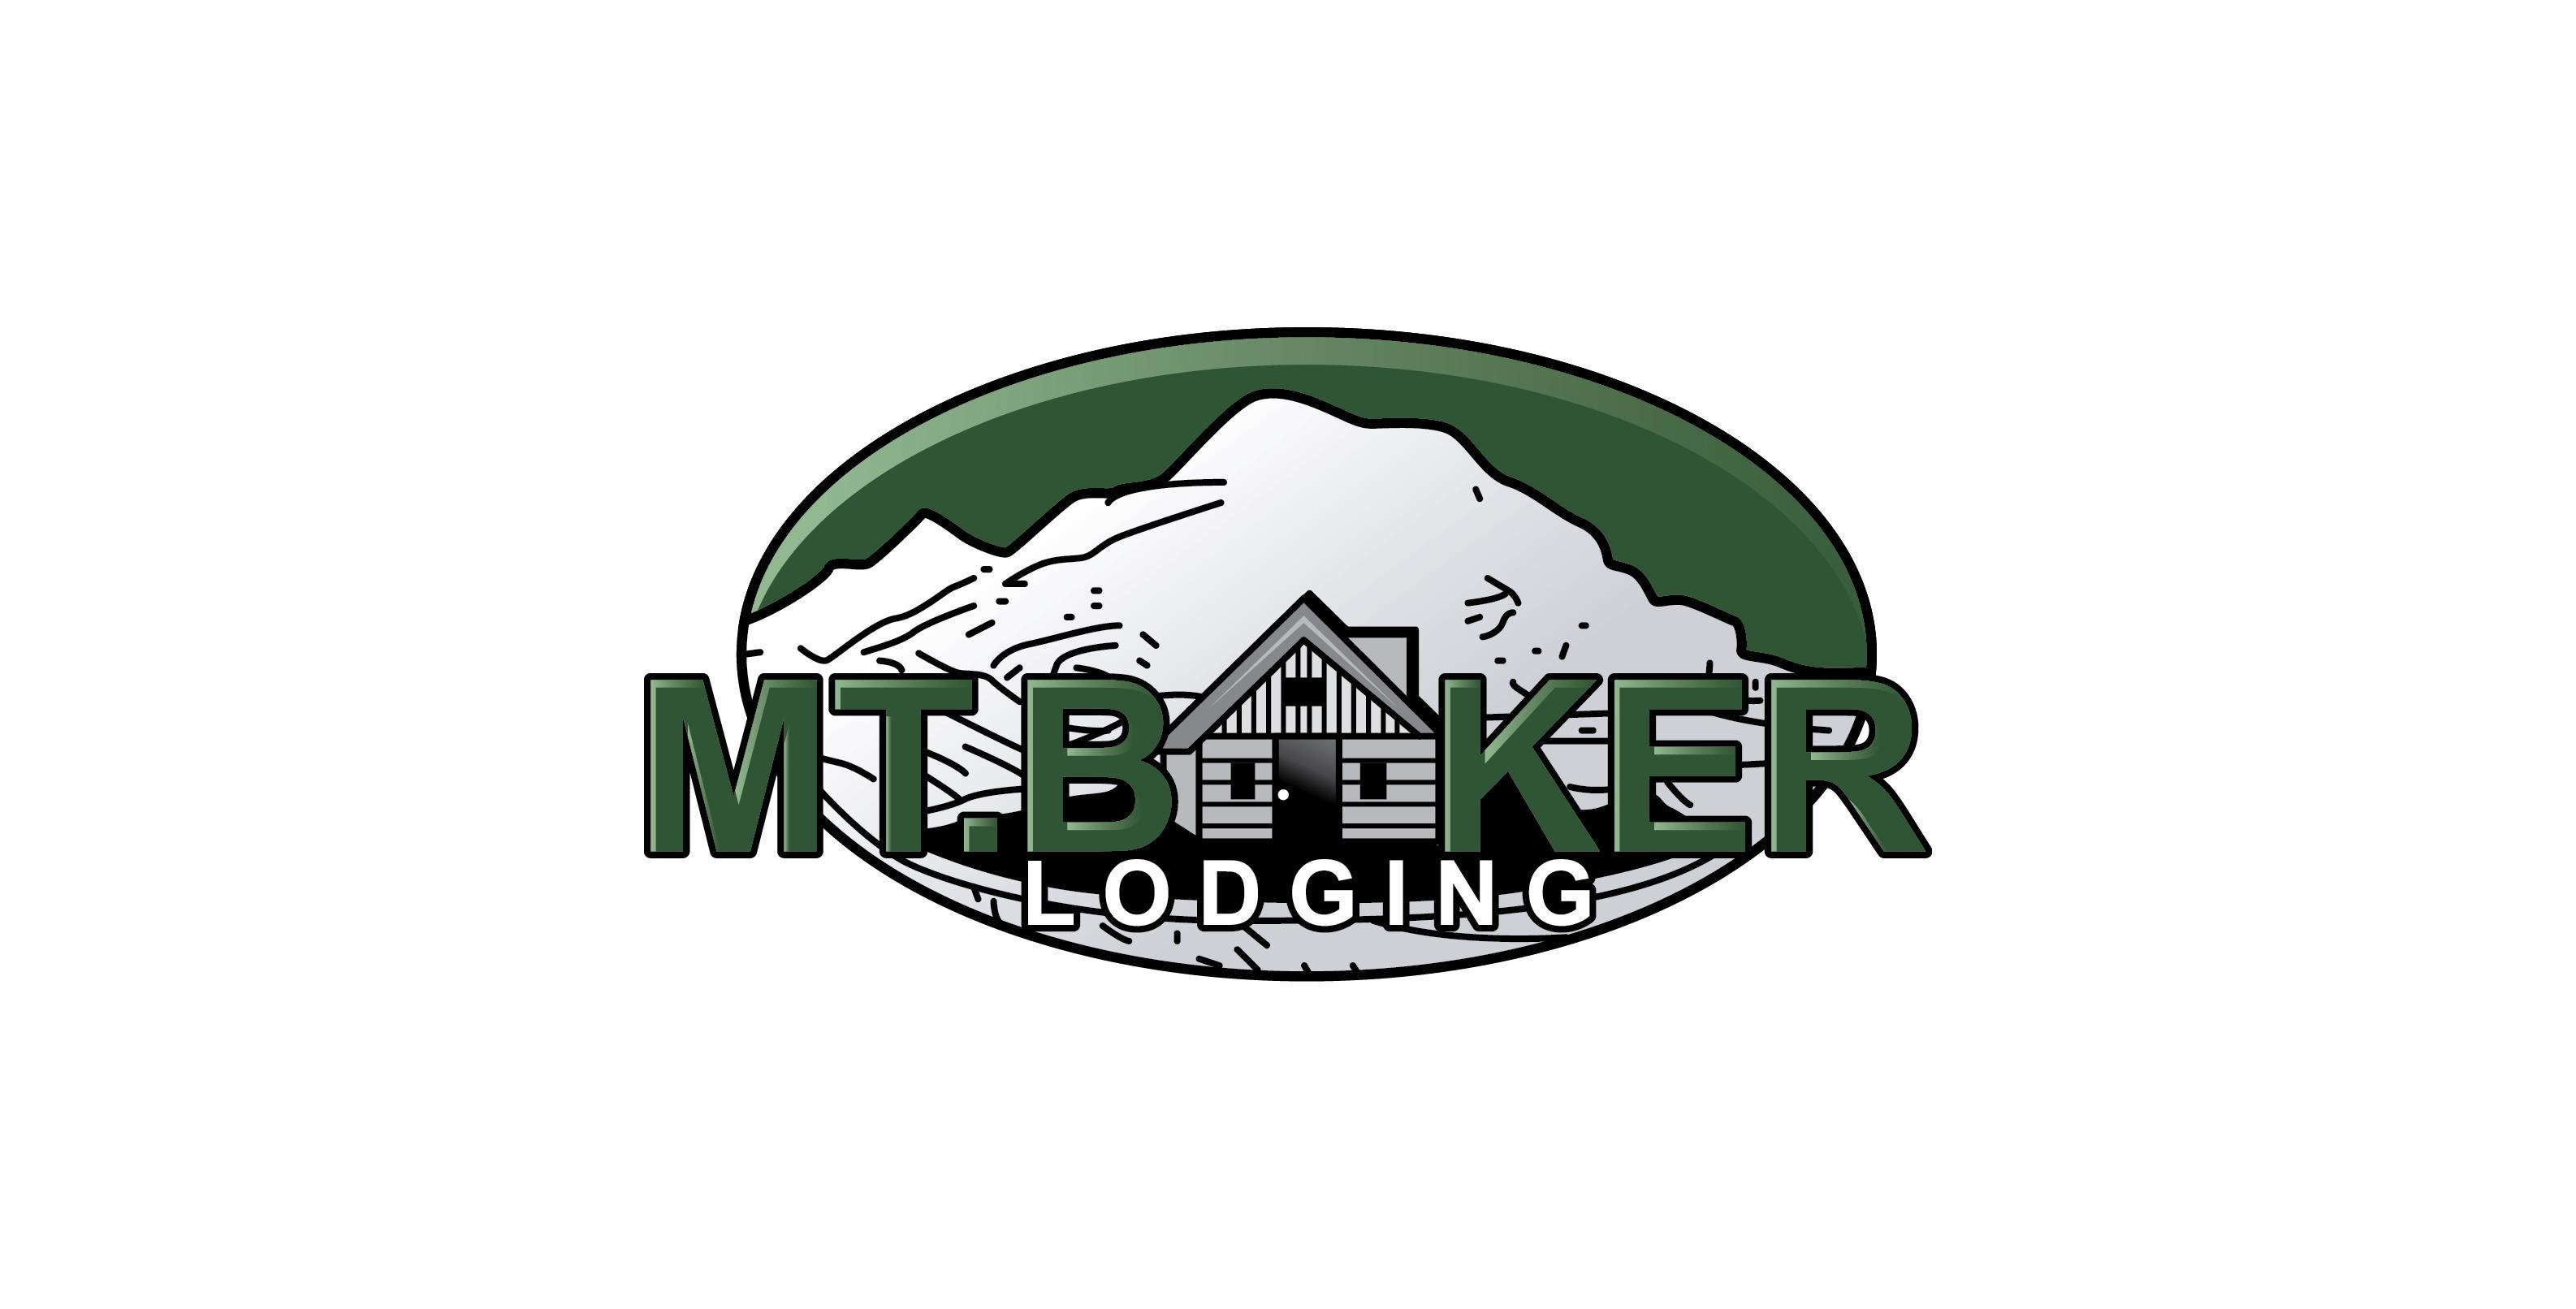 Apartment Mt  Baker Lodging Condo  14 - FIREPLACE  DISHWASHER WASHER DRYER  SLEEPS-6  photo 31816973